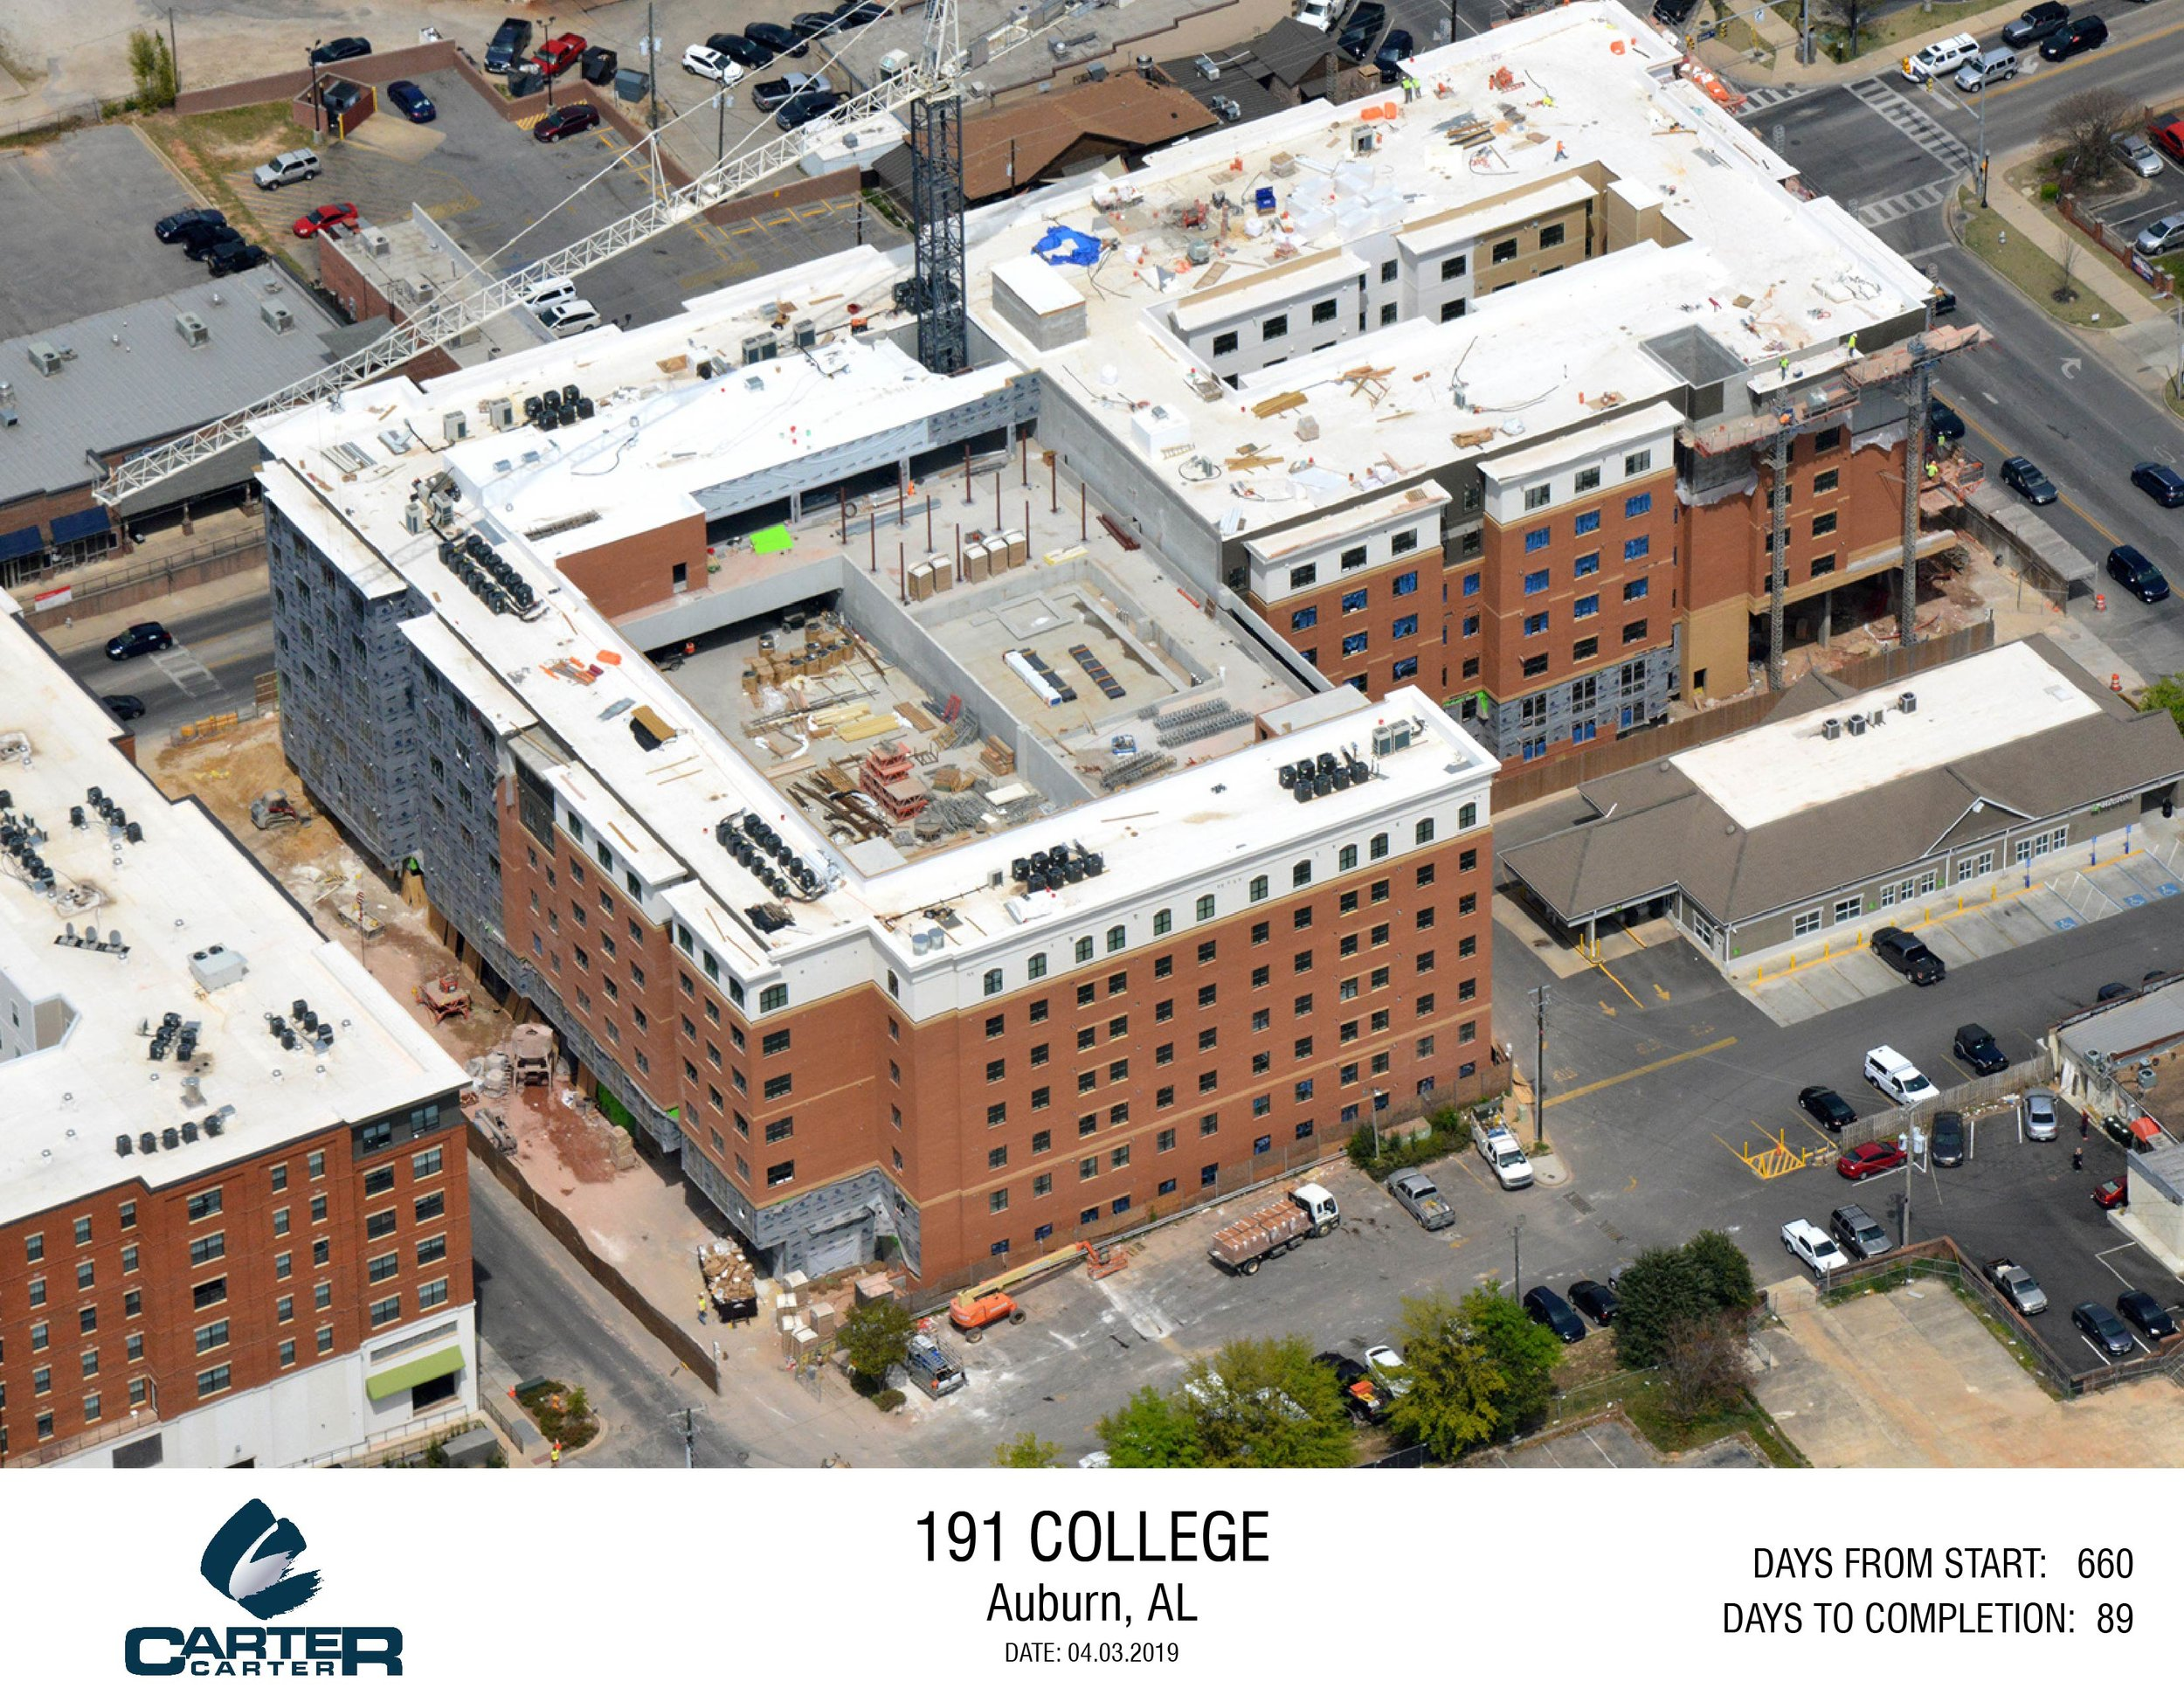 191 COLLEGE (IN PROGRESS) — Carter & Carter Construction